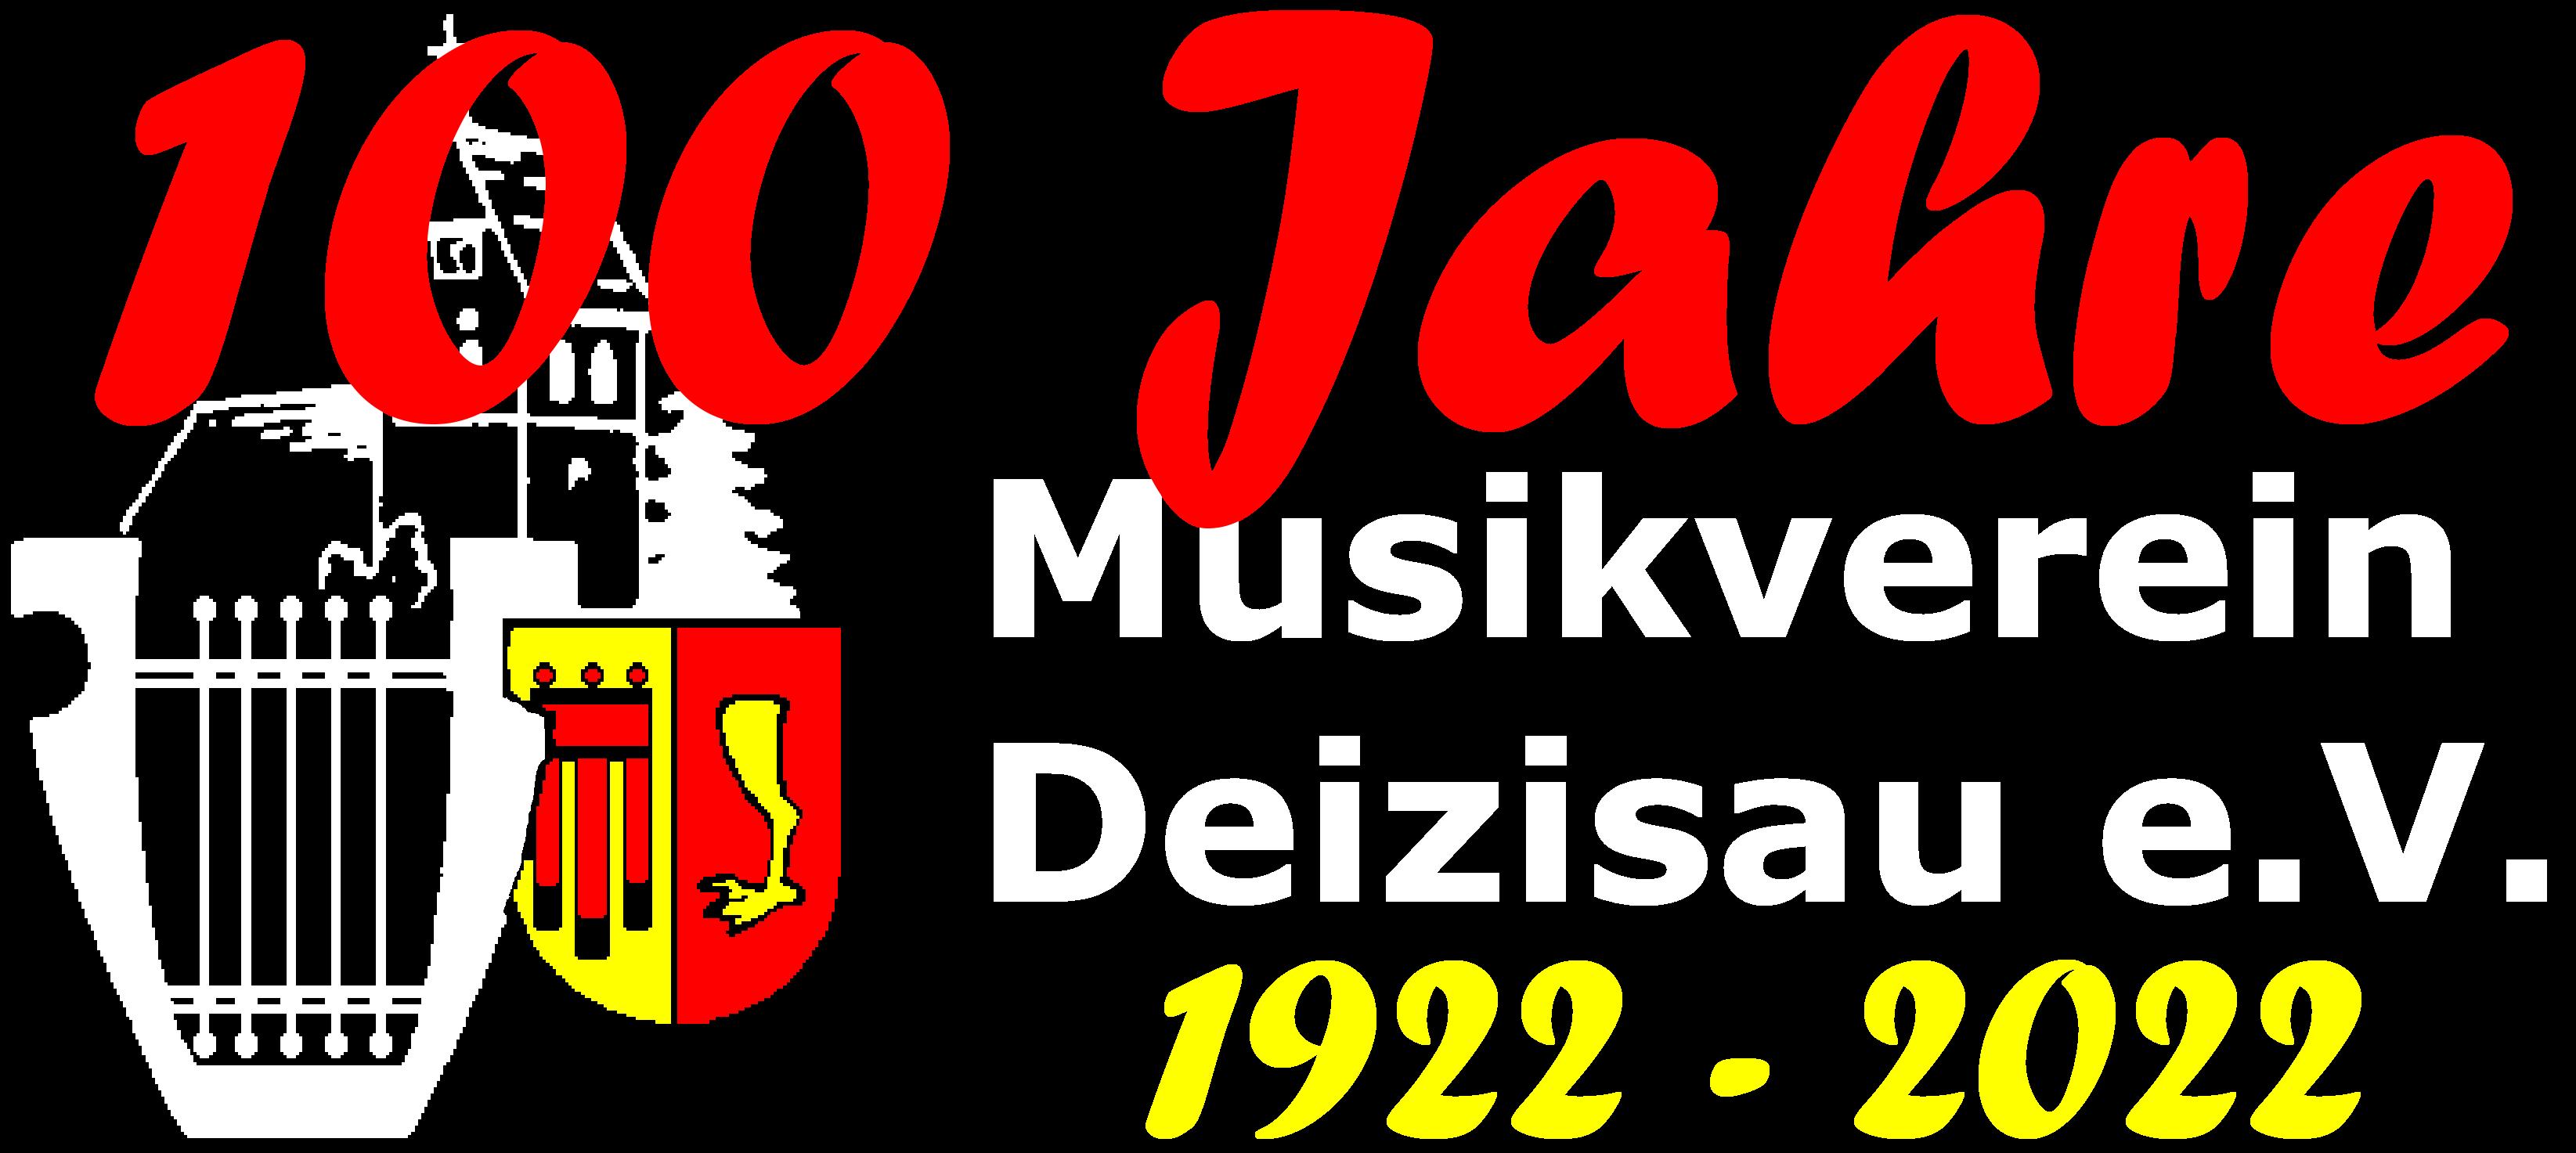 Musikverein Deizisau e.V.